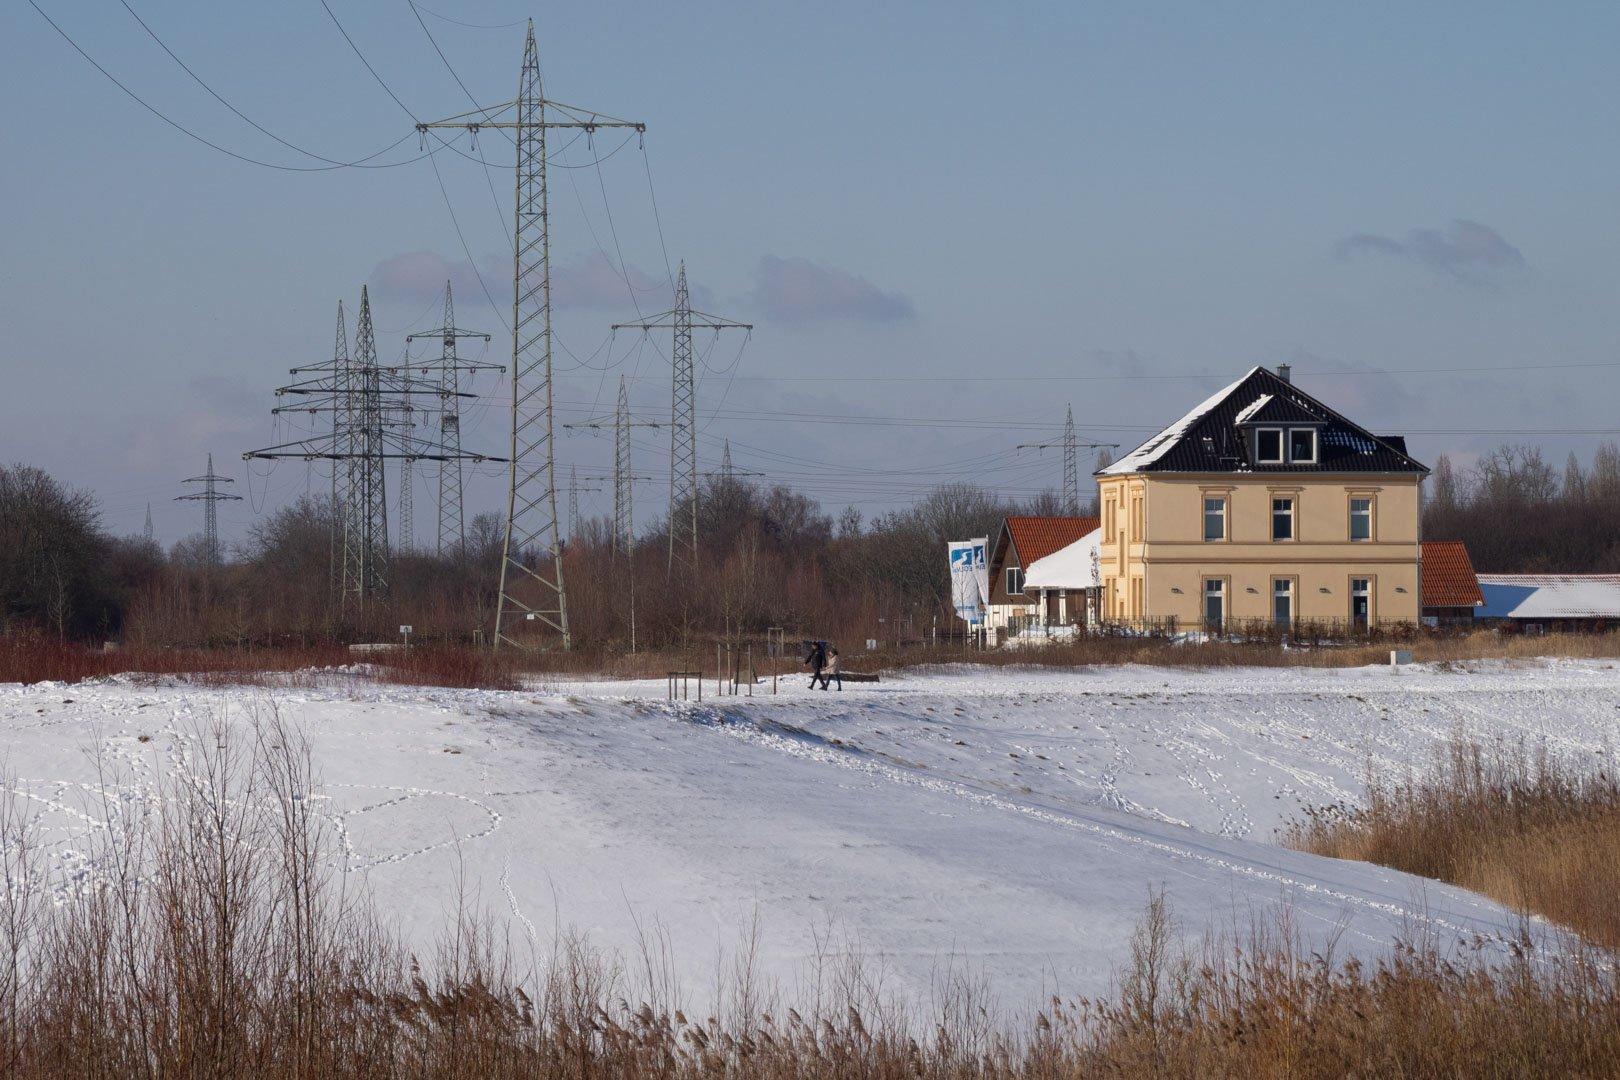 11-do-mengede-hrb-emscheraue